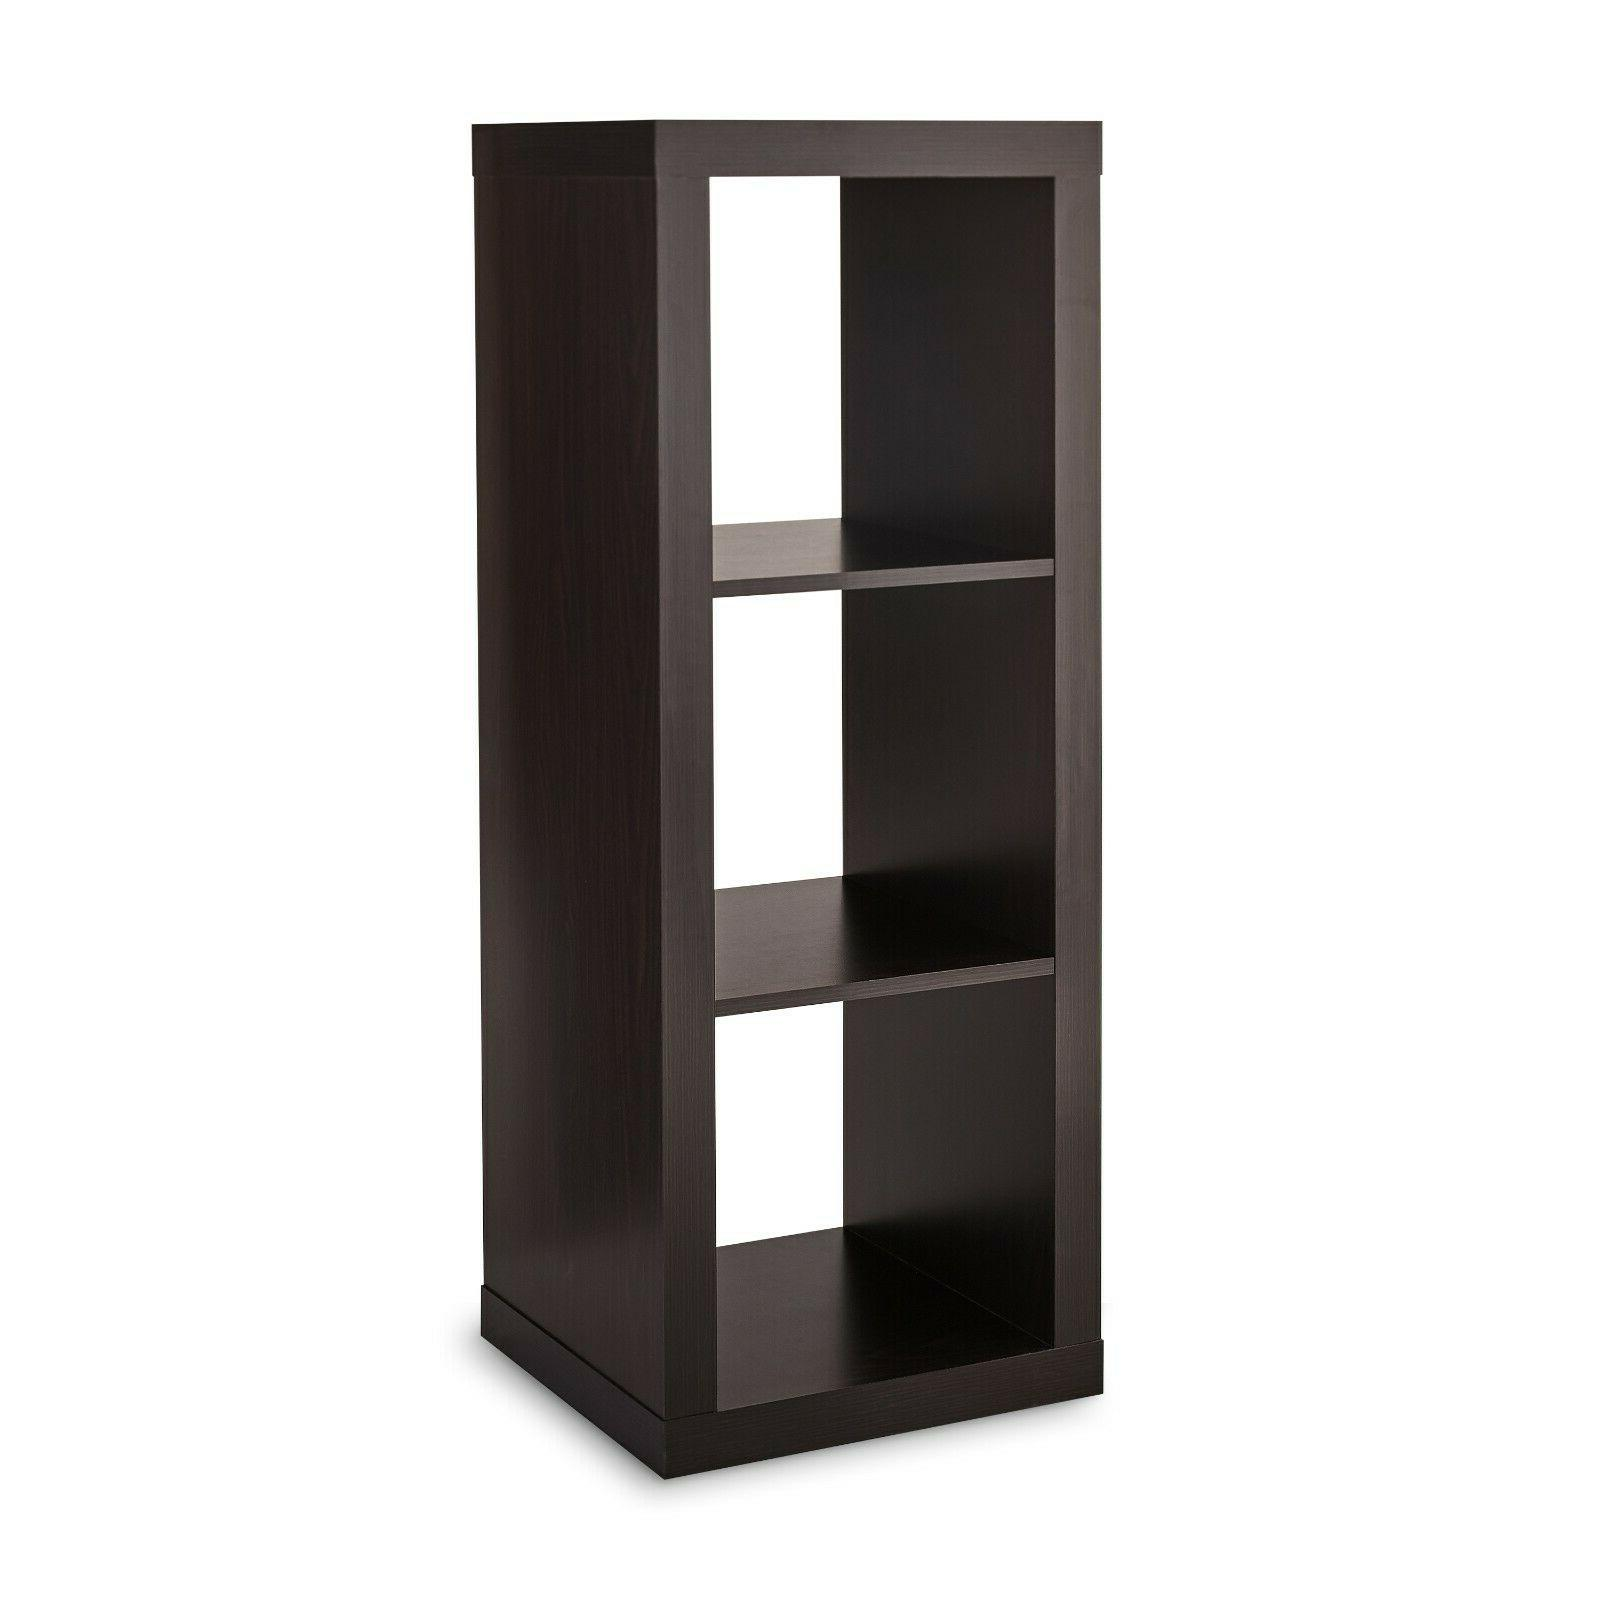 3 cube storage organizer espresso furniture book